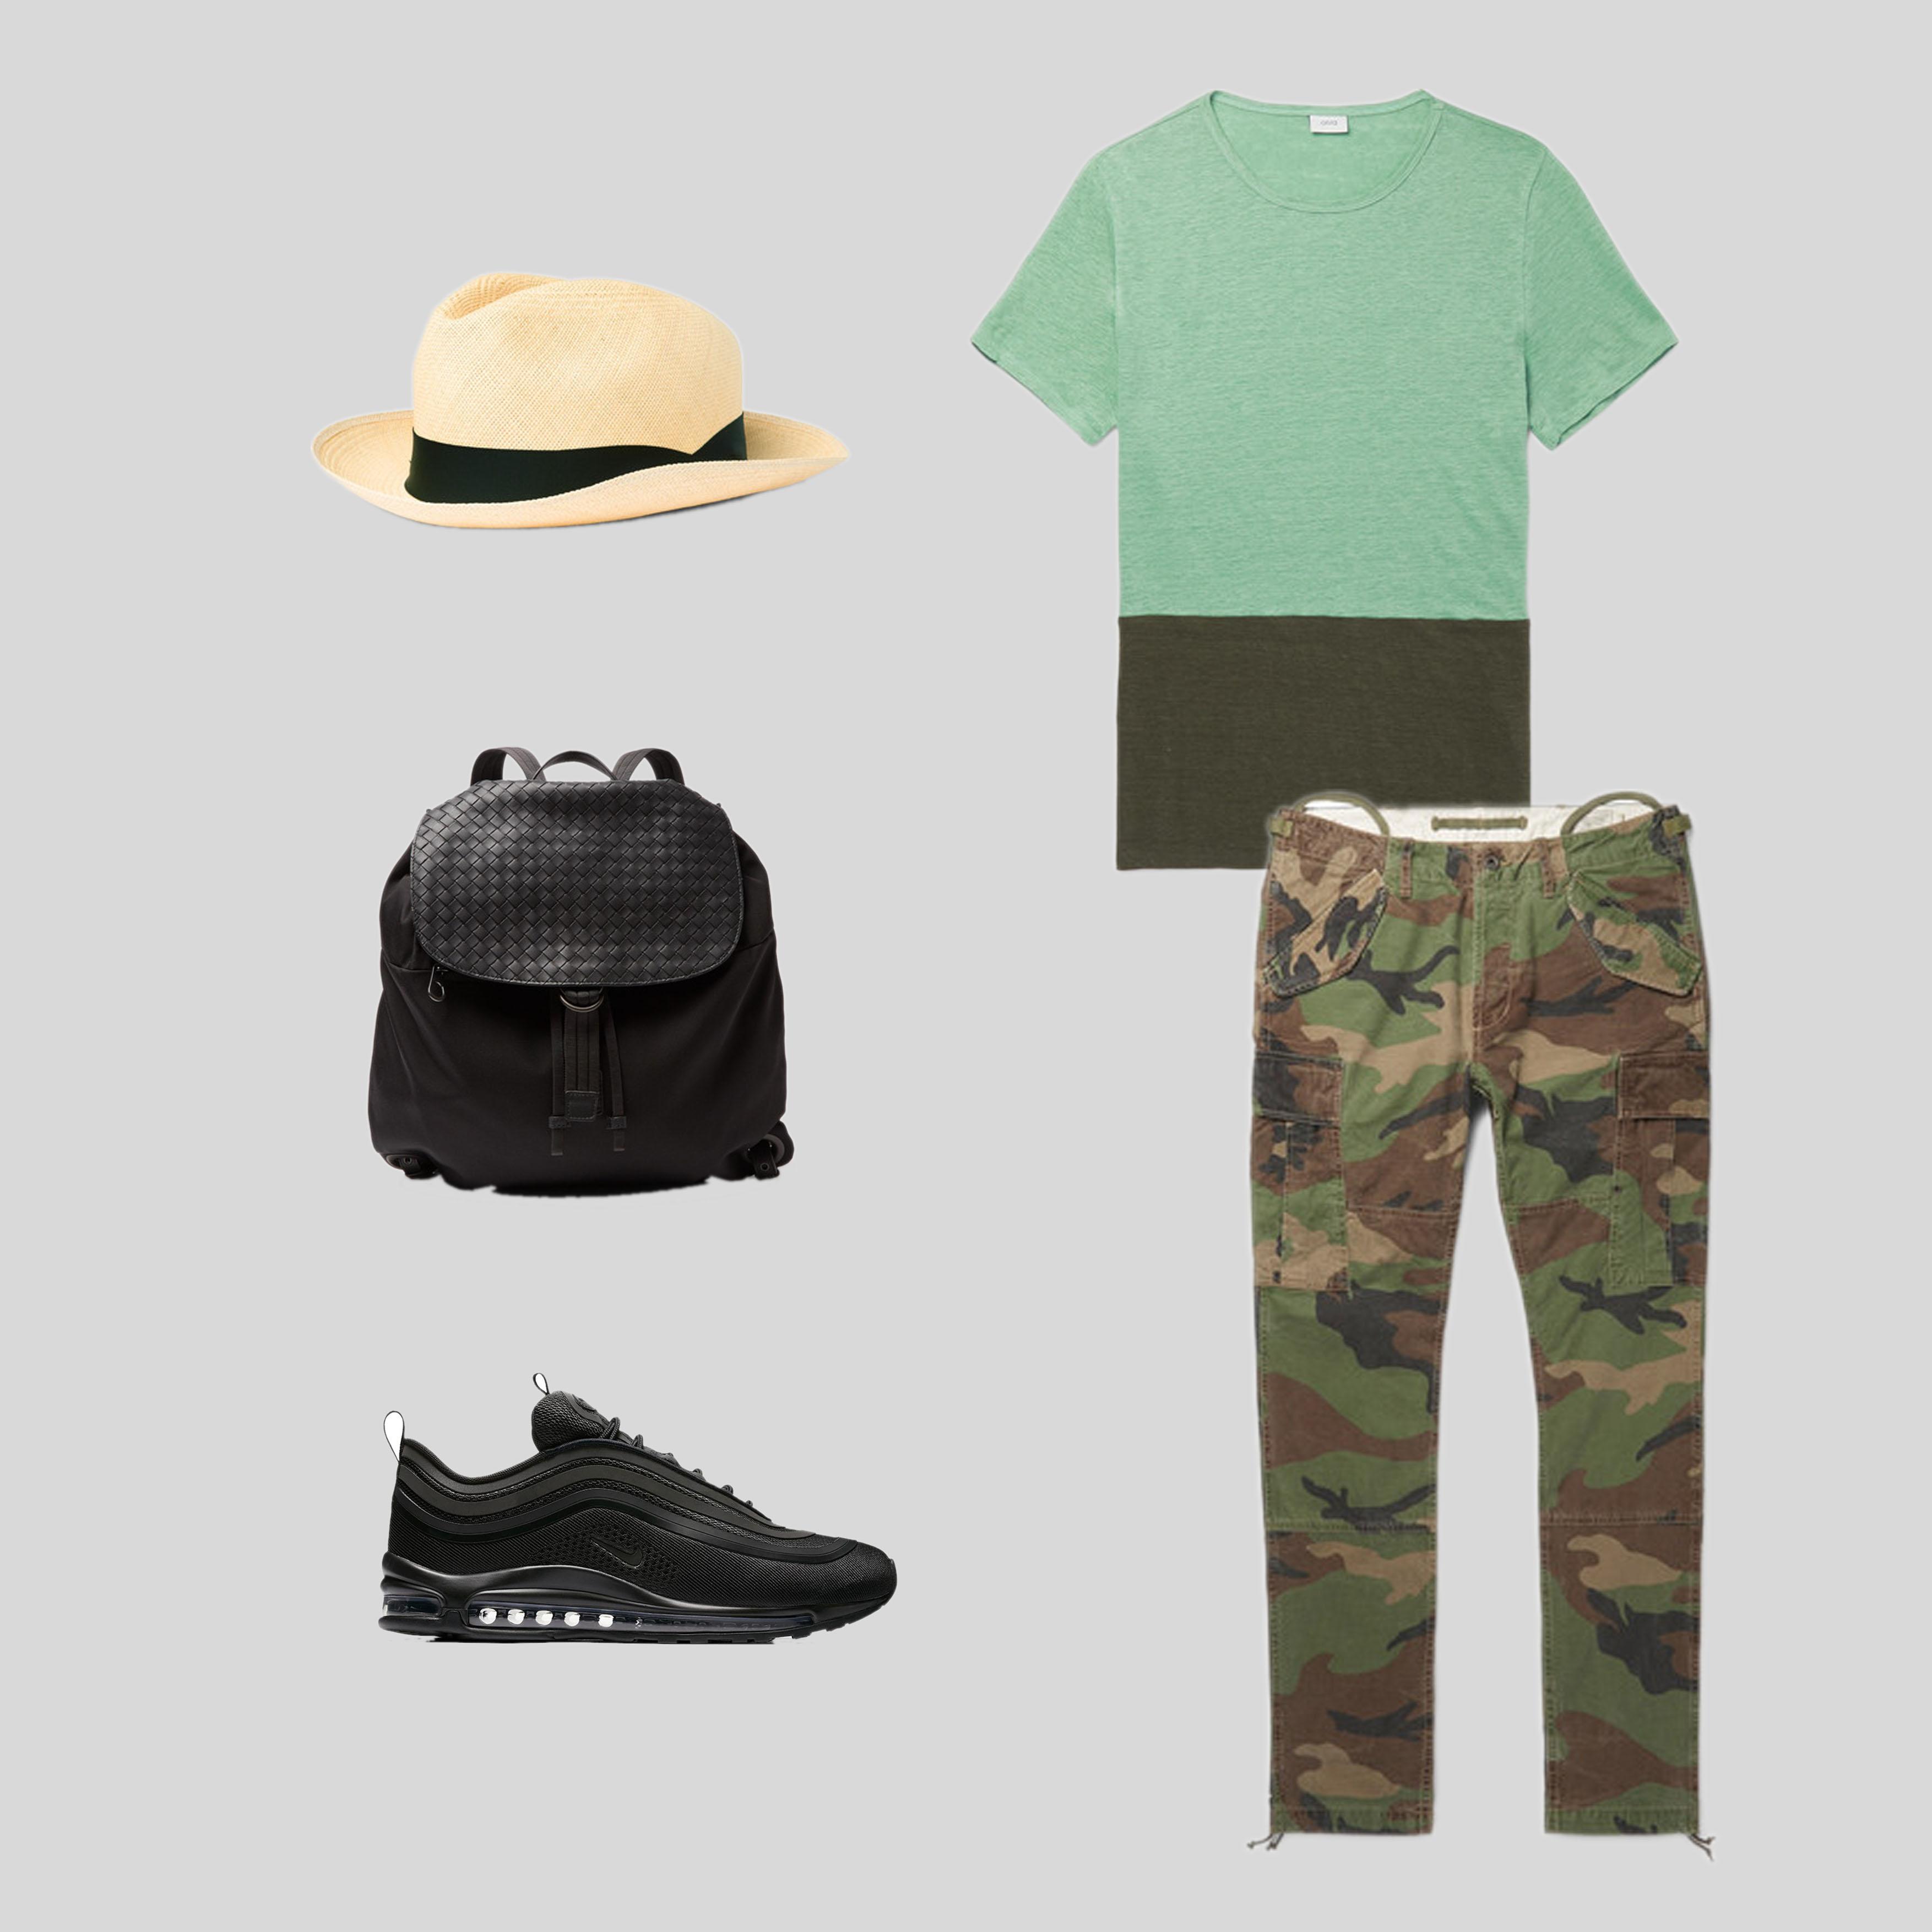 ELLE Man Style Calendar phối đồ ăn ý với mũ cói (5)